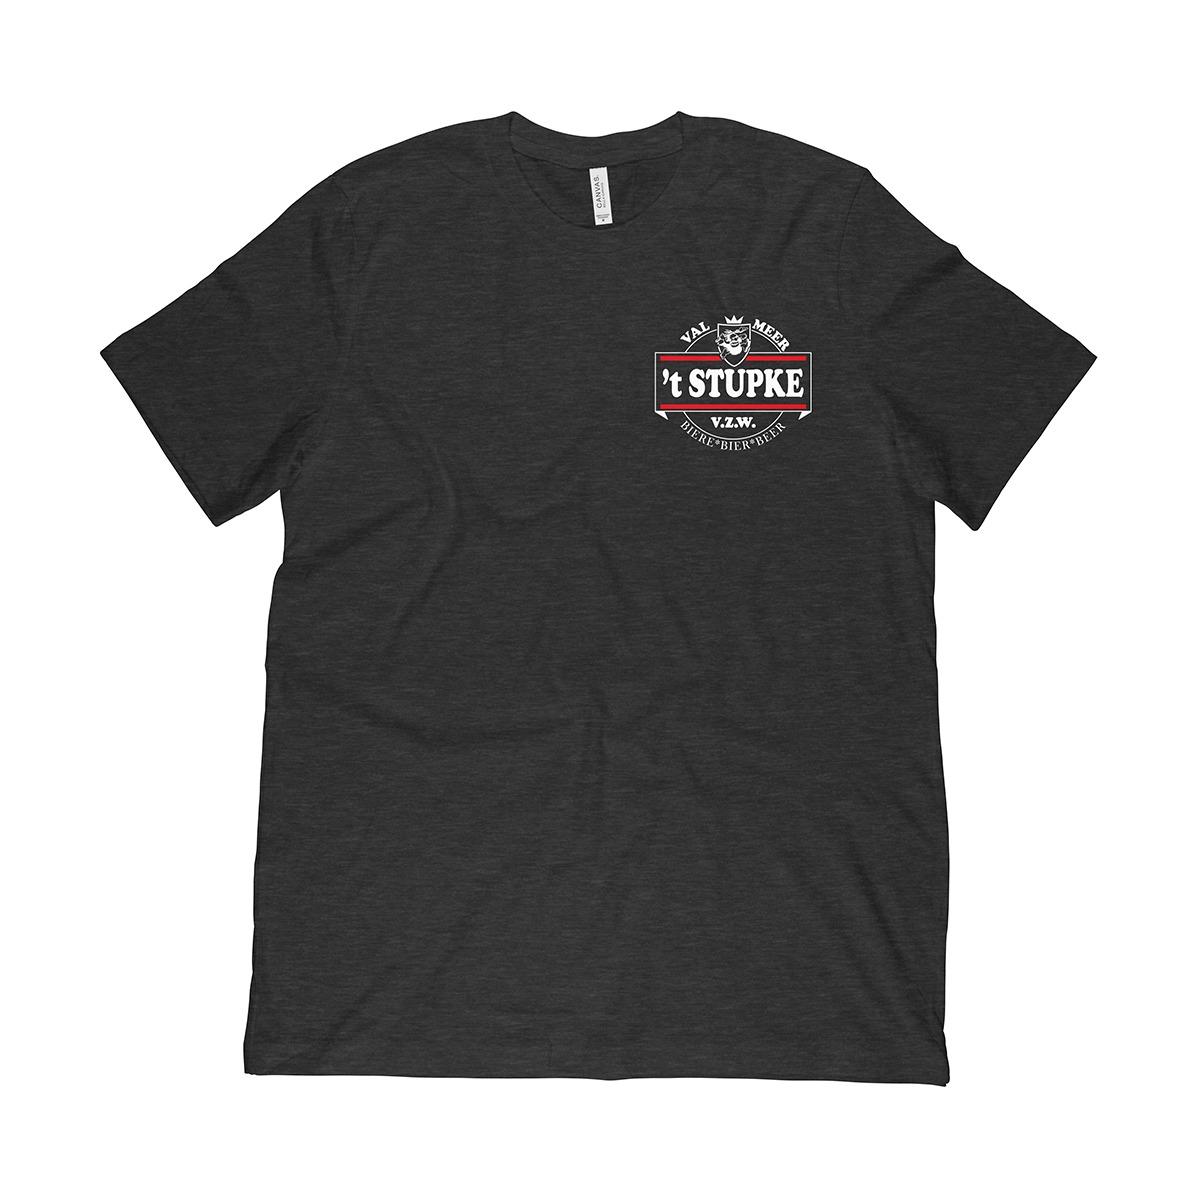 tstupke_shirt_front